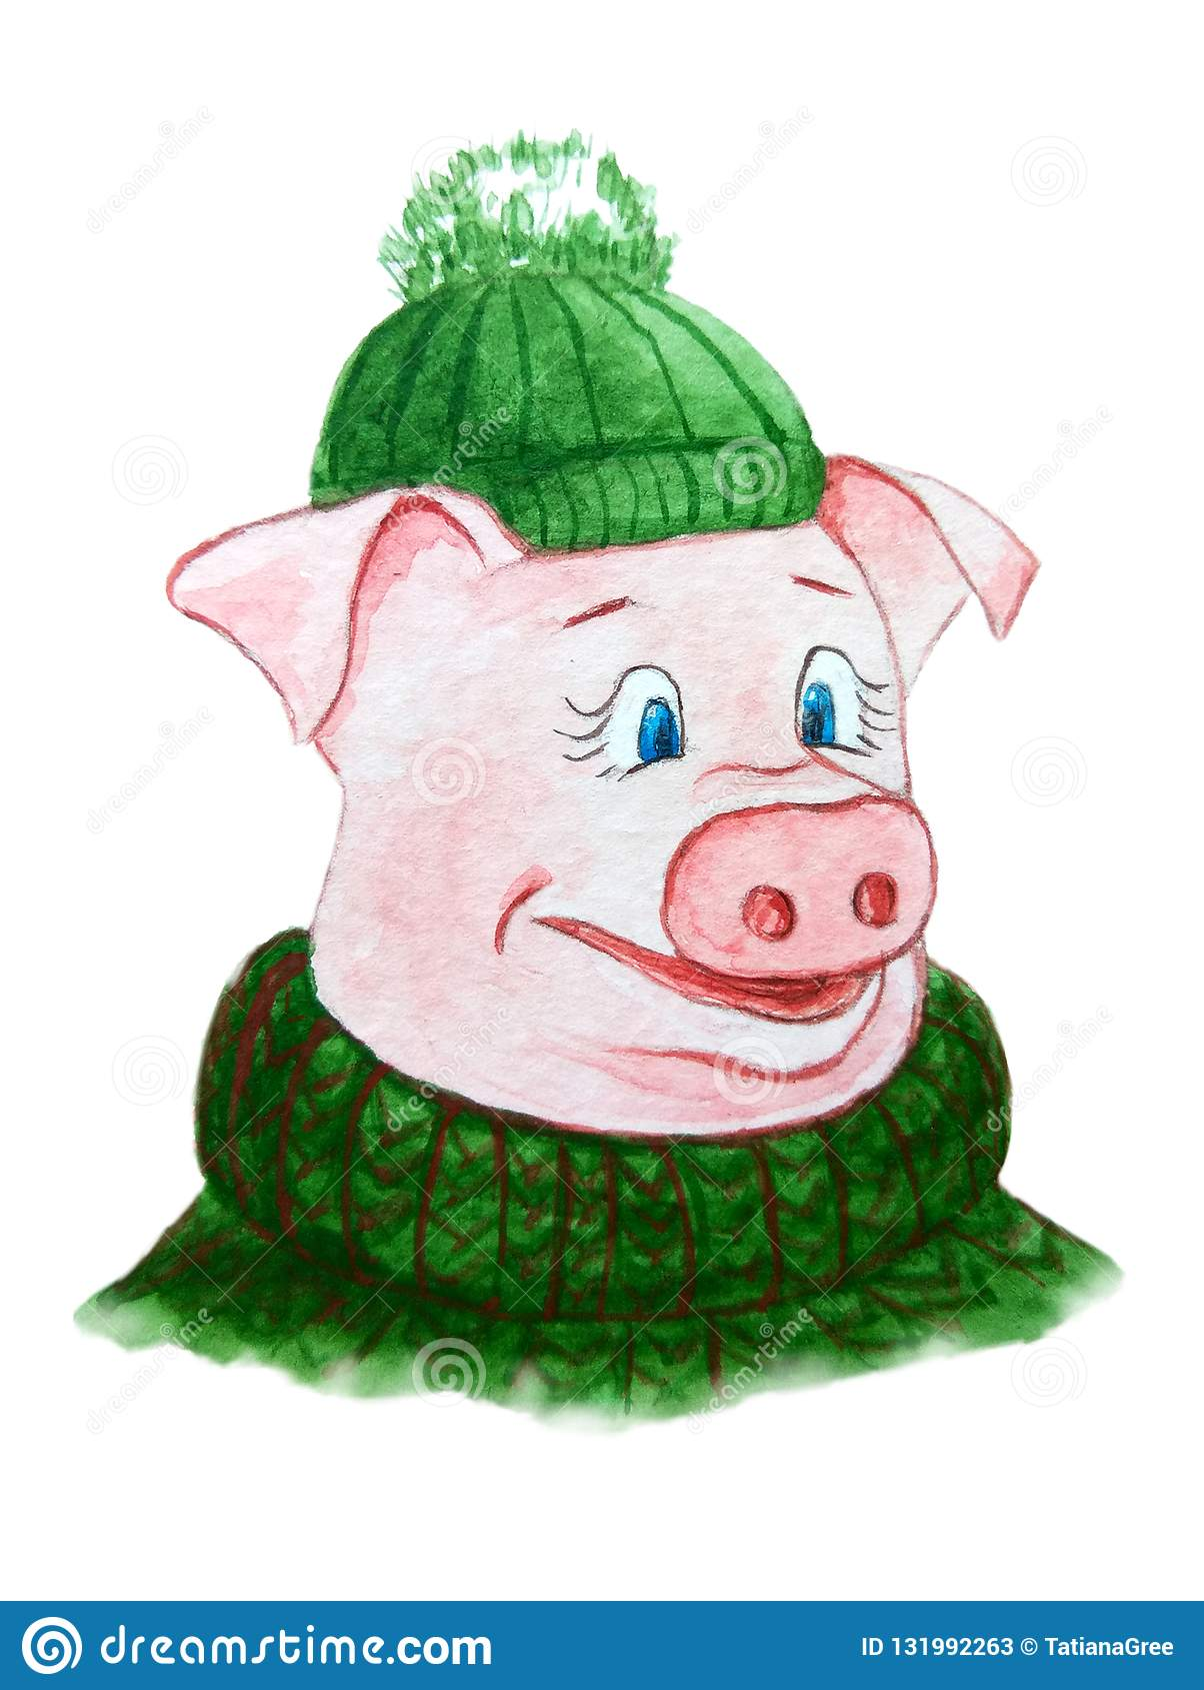 Grappig piggy karakter in een groene hoed en warme sweater